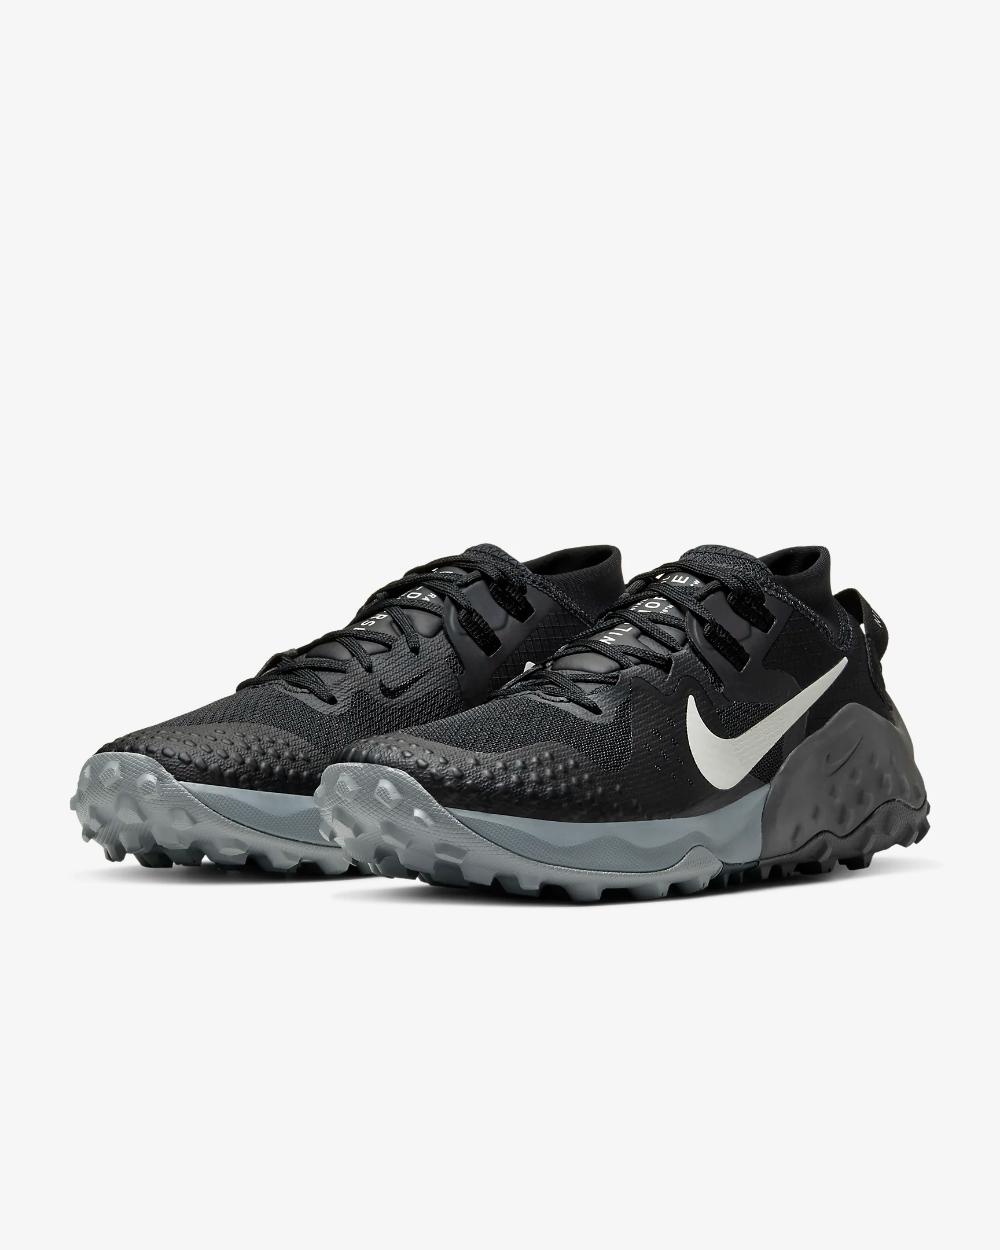 lino Intestinos Comida sana  Calzado de trail running para mujer Nike Wildhorse 6. Nike MX en 2020 | Nike,  Nike mujer, Calzas